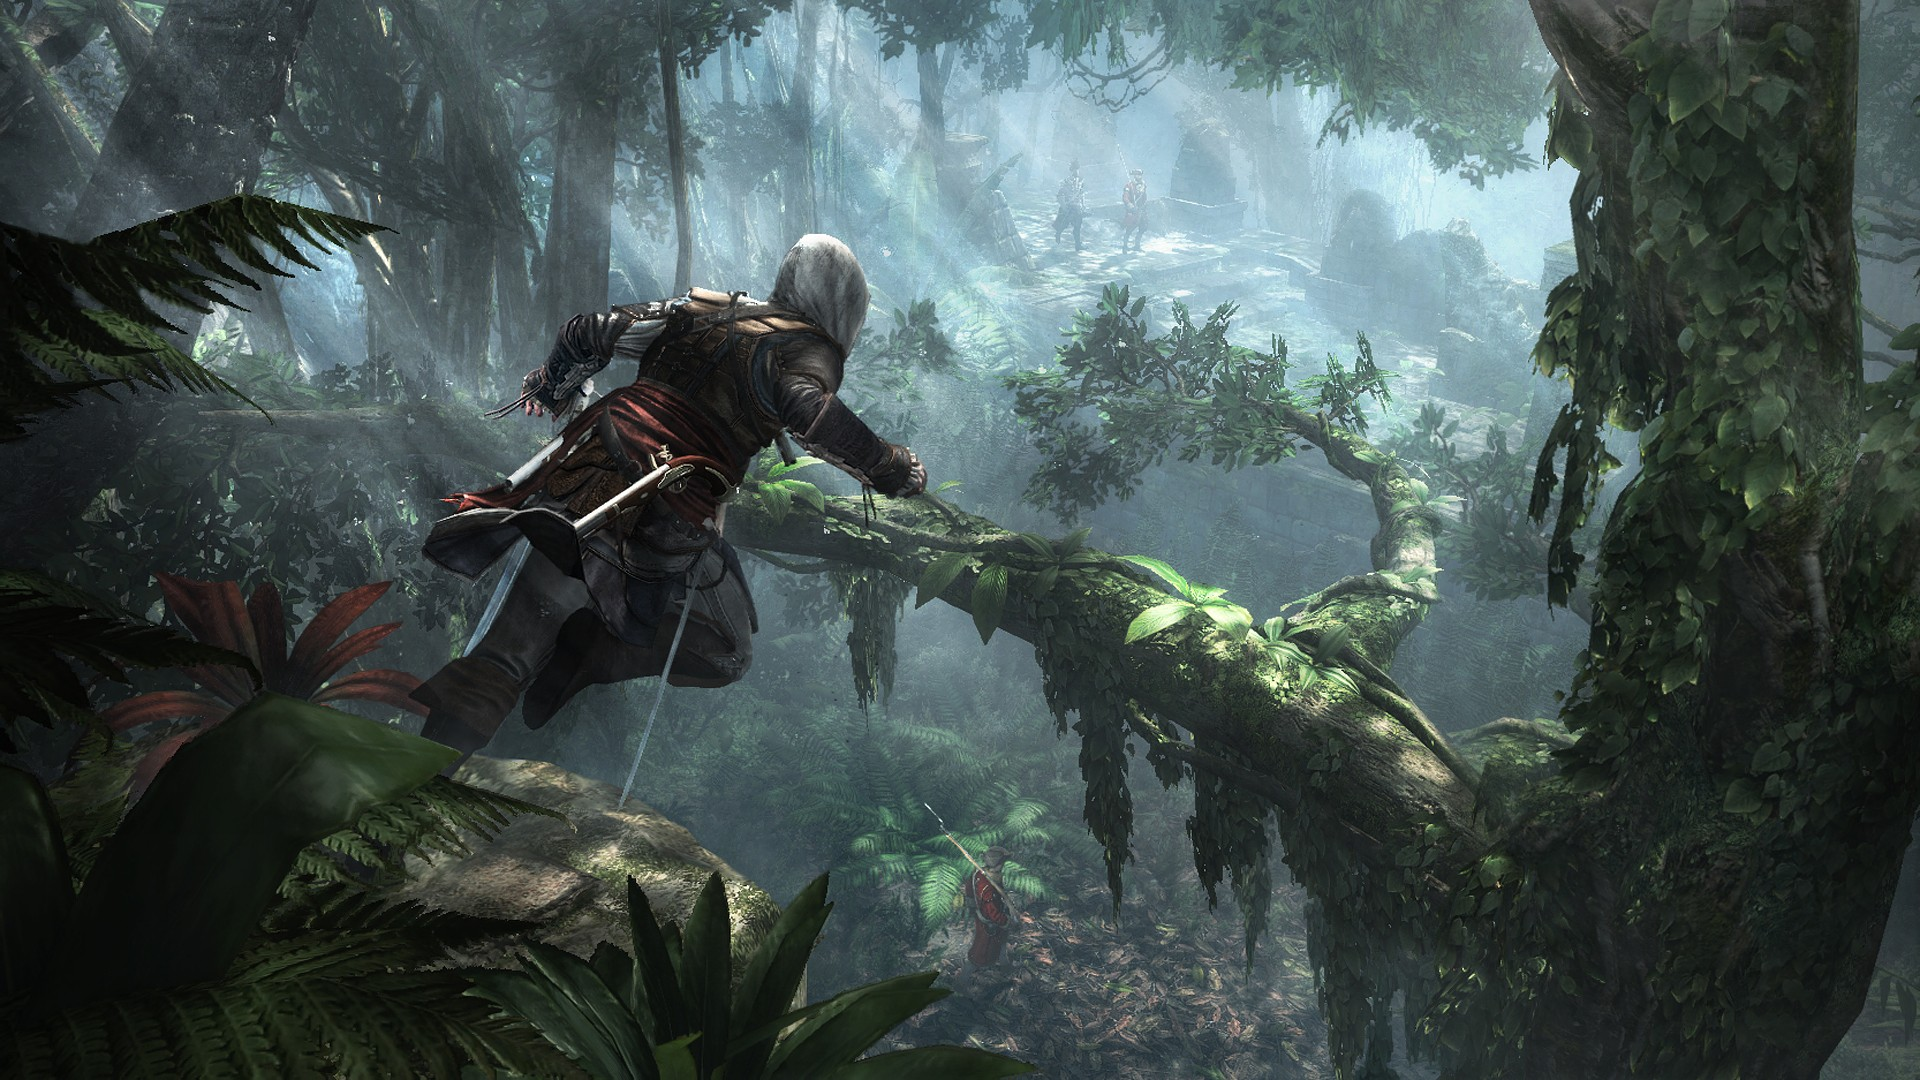 Free Download Assassins Creed Iv Black Flag Wallpaper Image